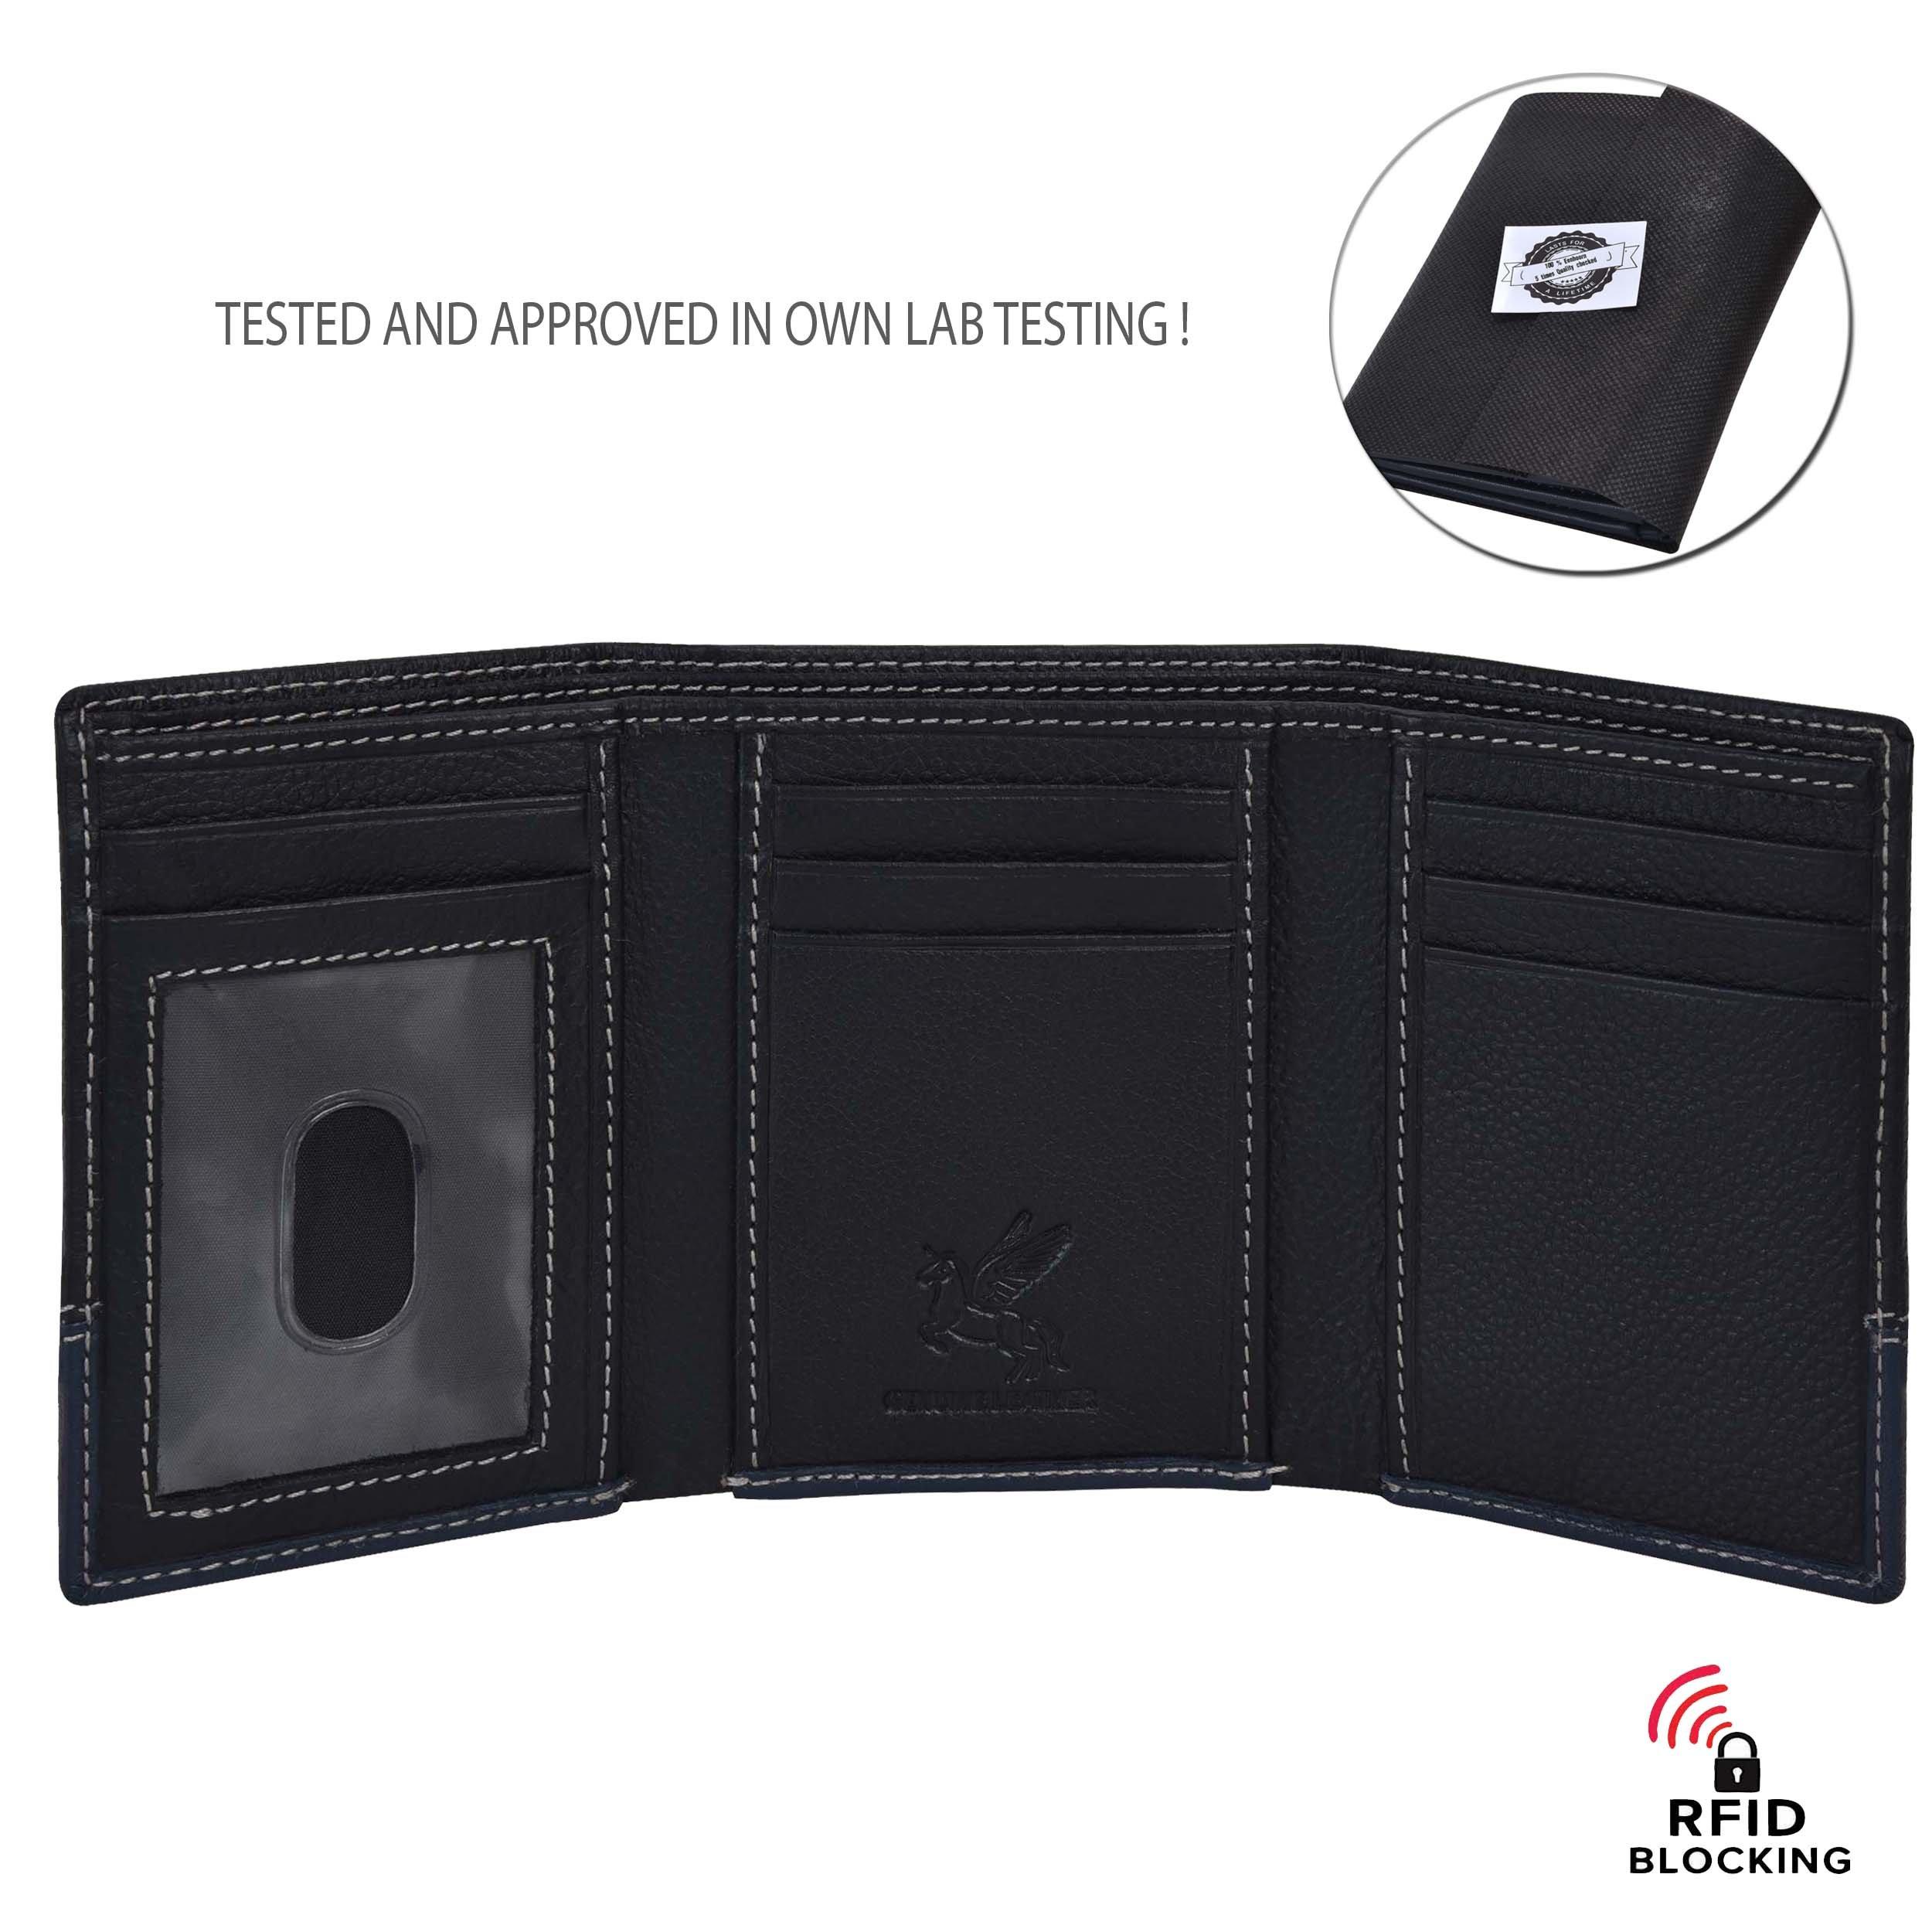 RFID Leather Trifold Wallets for Men - Handmade Slim Mens Wallet 6 Credit Card ID Window and Gift Box Secure by EENHORRAN (Black & Navy) by EENHORRAN (Image #3)